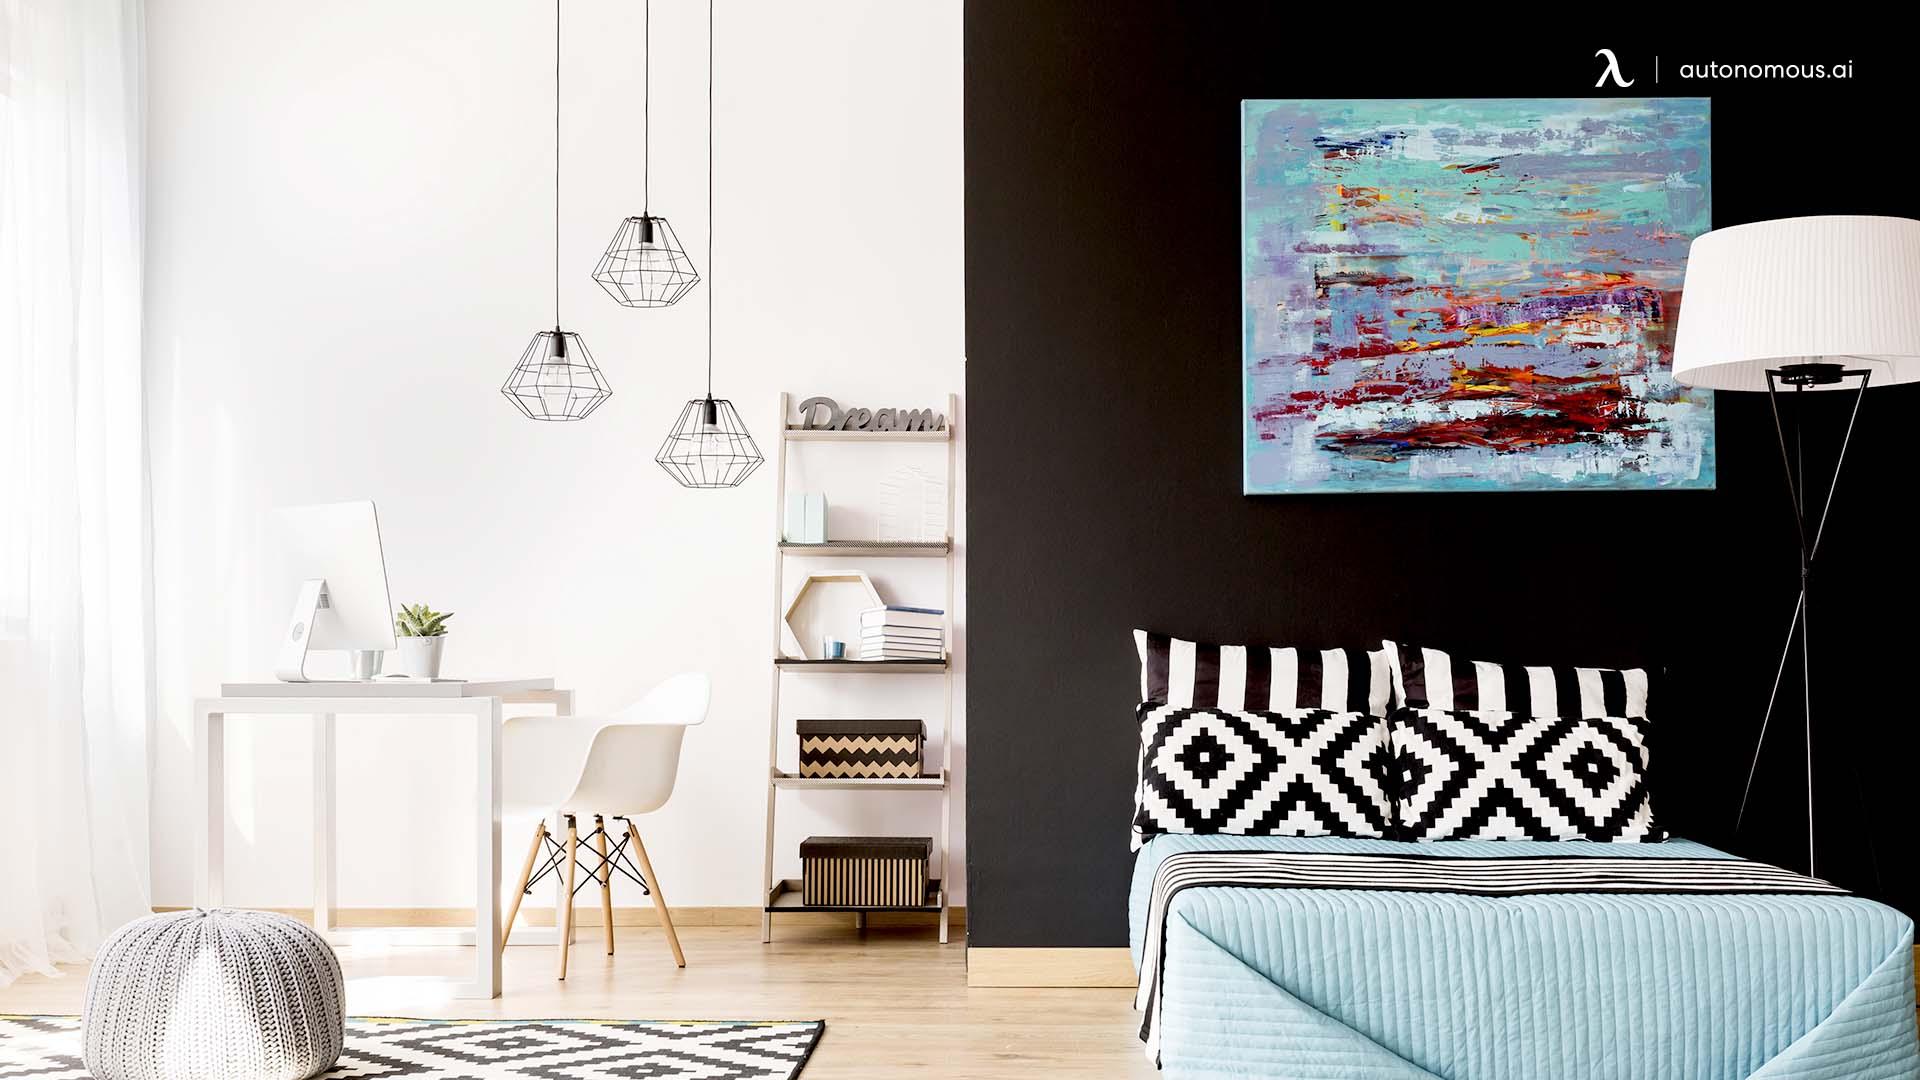 White/Bright Bedroom Design